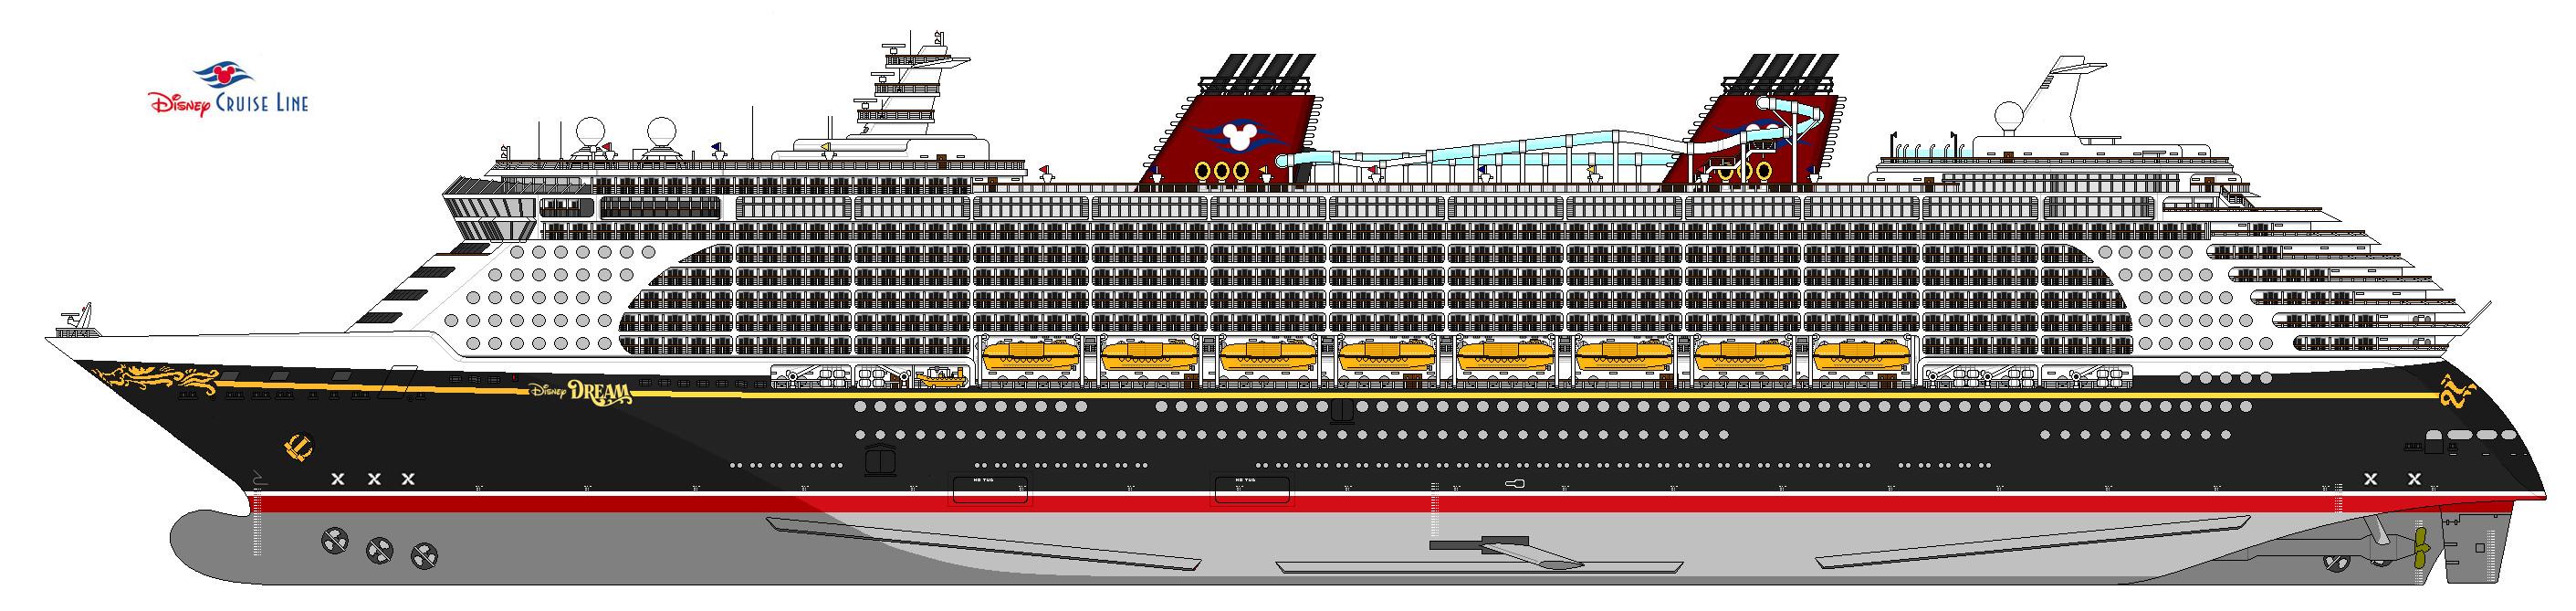 2822x669 My New Project Disney Dream By Lupin3ita